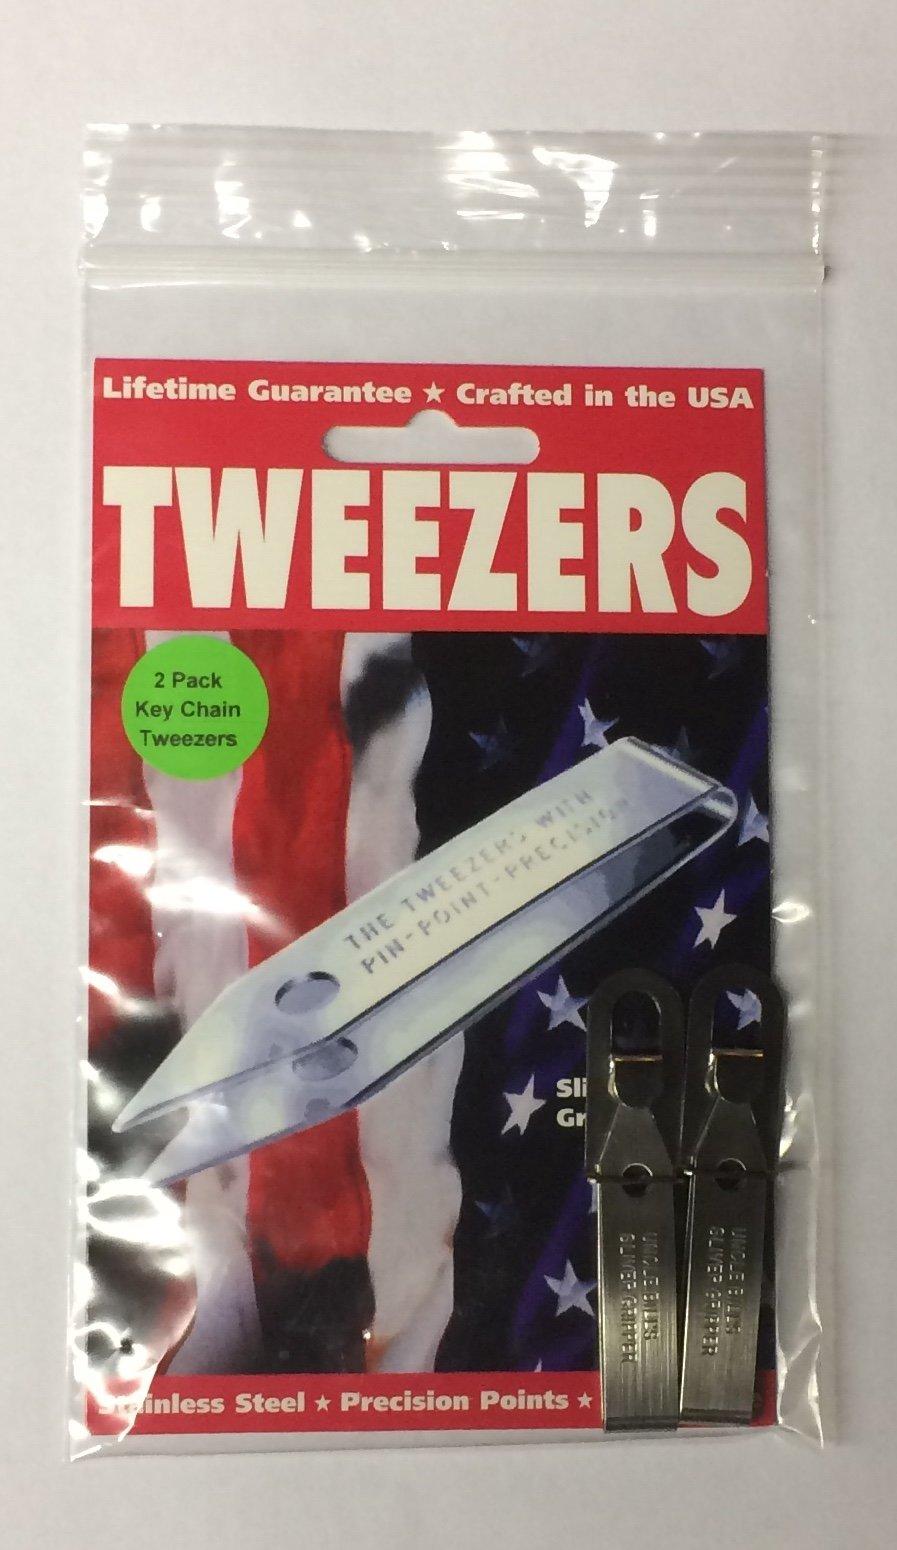 2 Pack Uncle Bills Sliver Gripper Precision Key Chain Tweezers